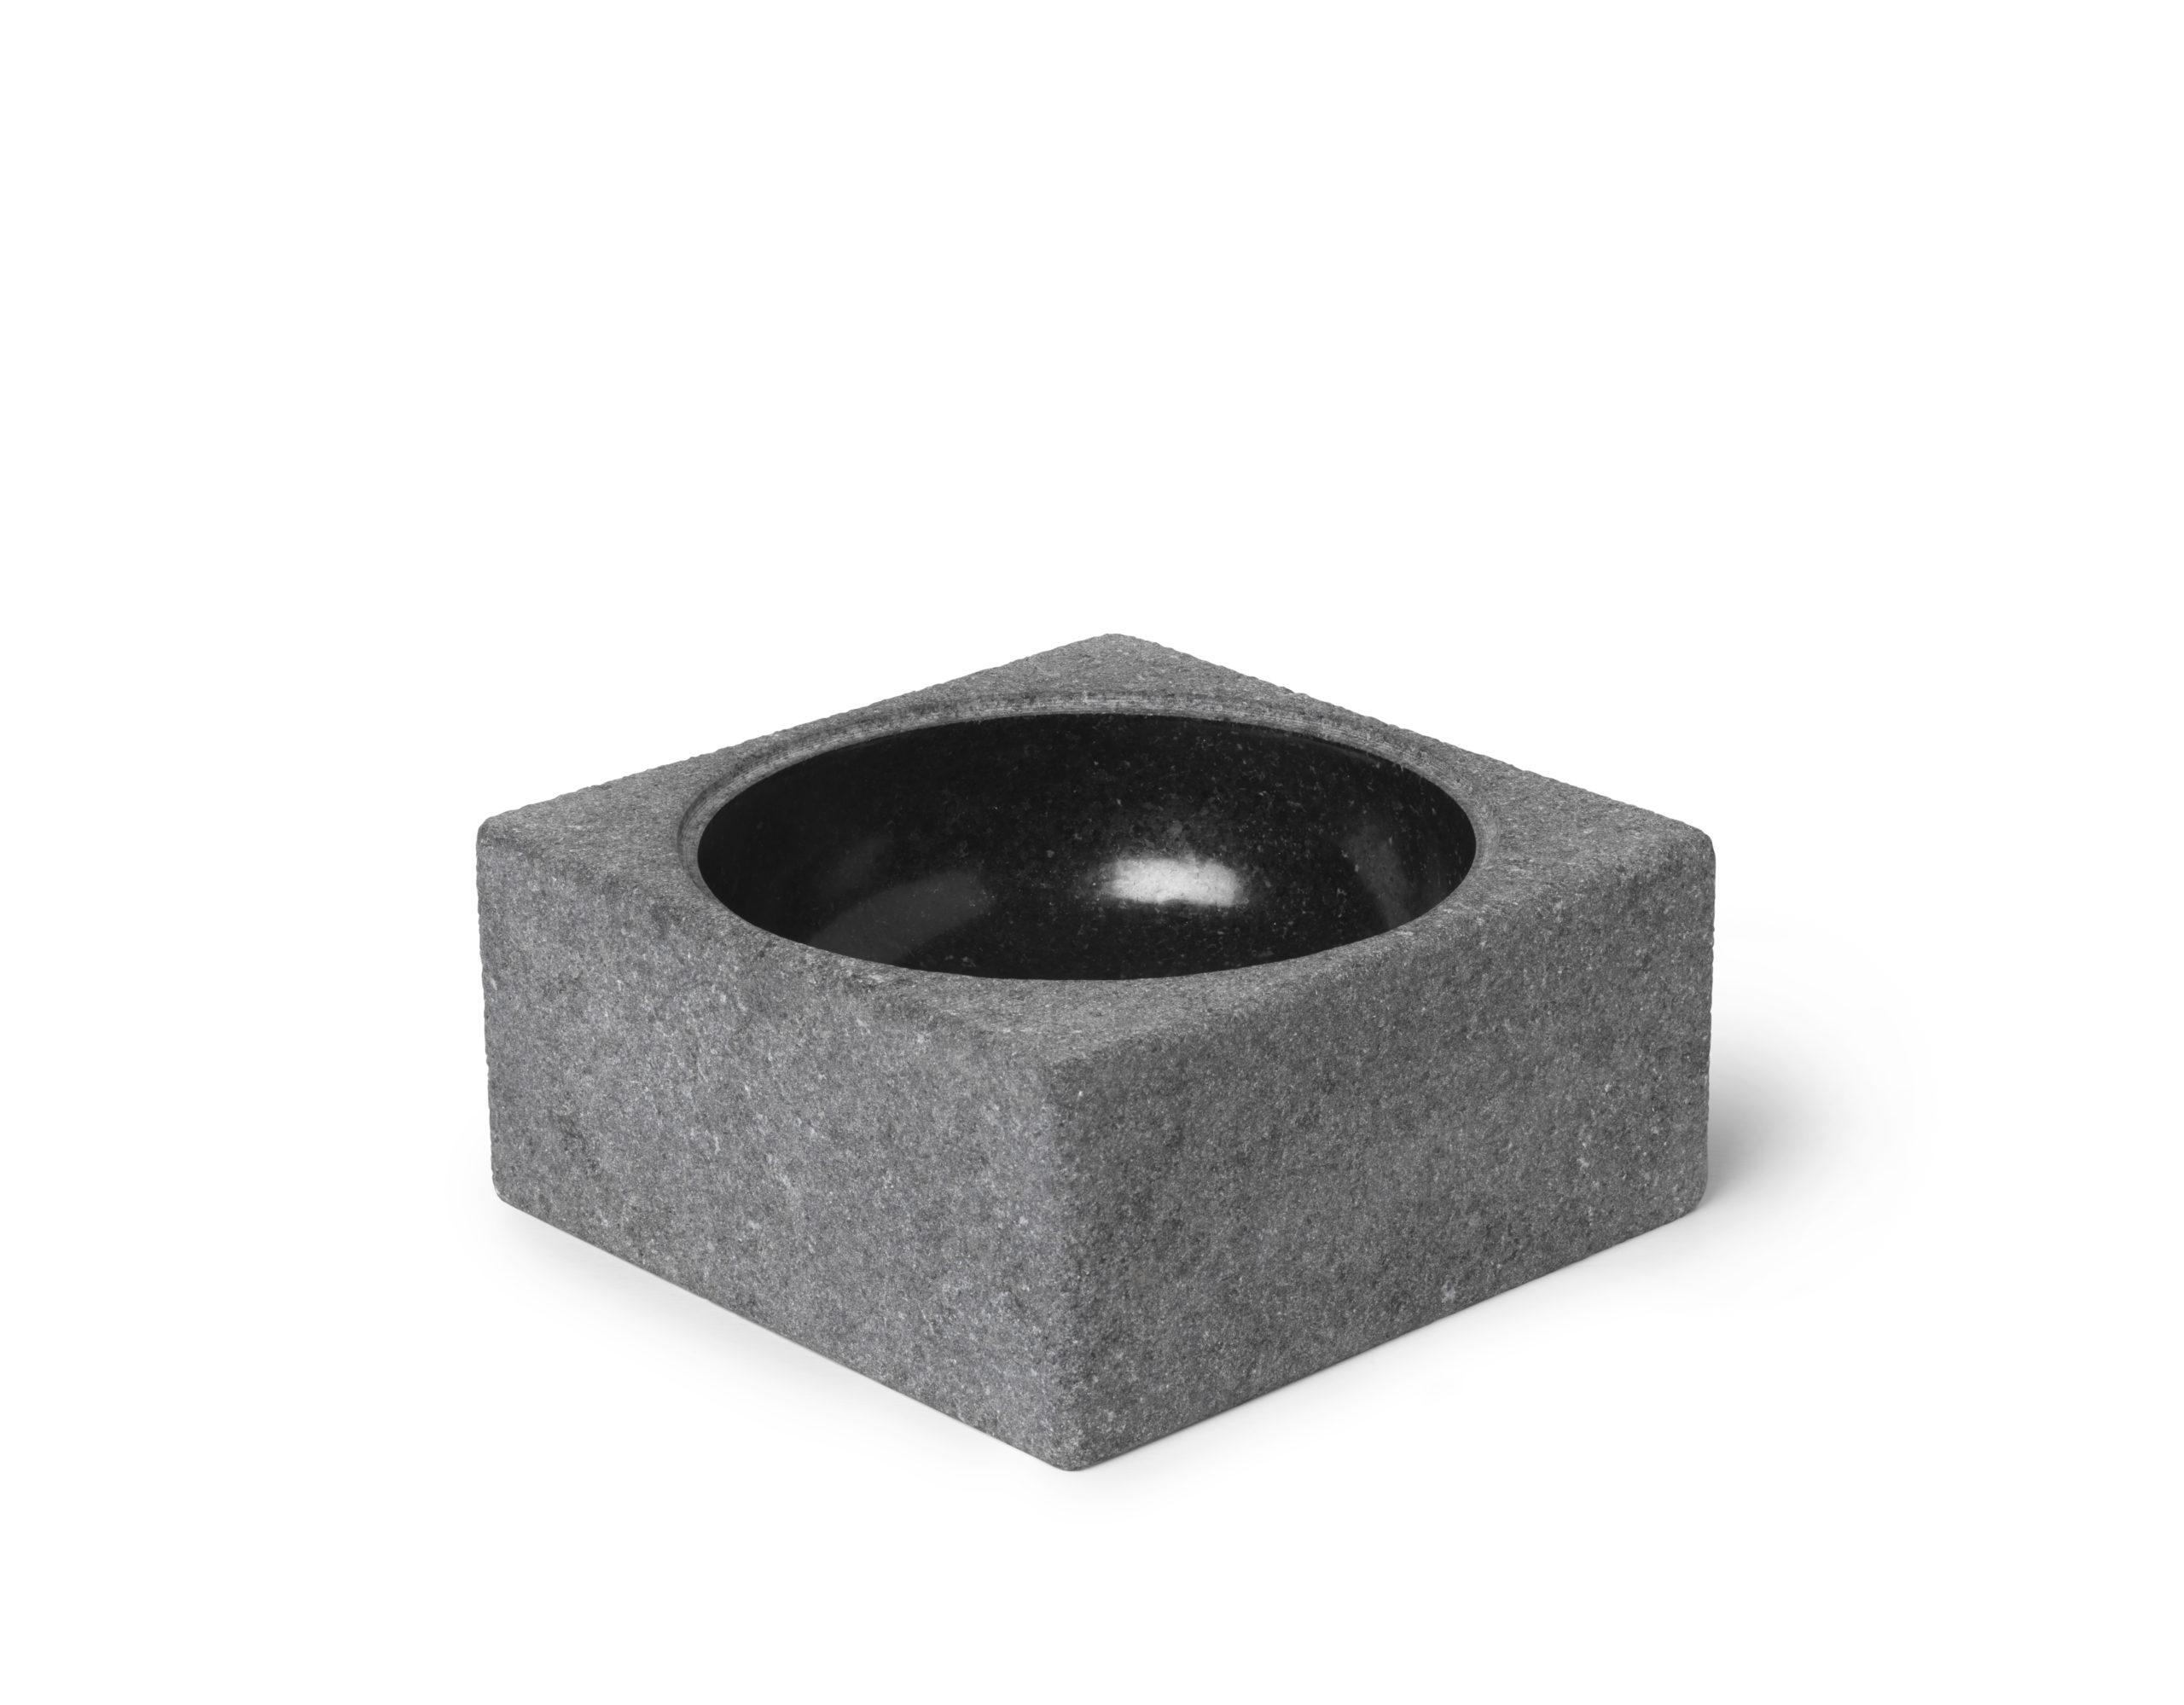 ARCHITECTMADE PK Bowl Granite Poul Kjærholm